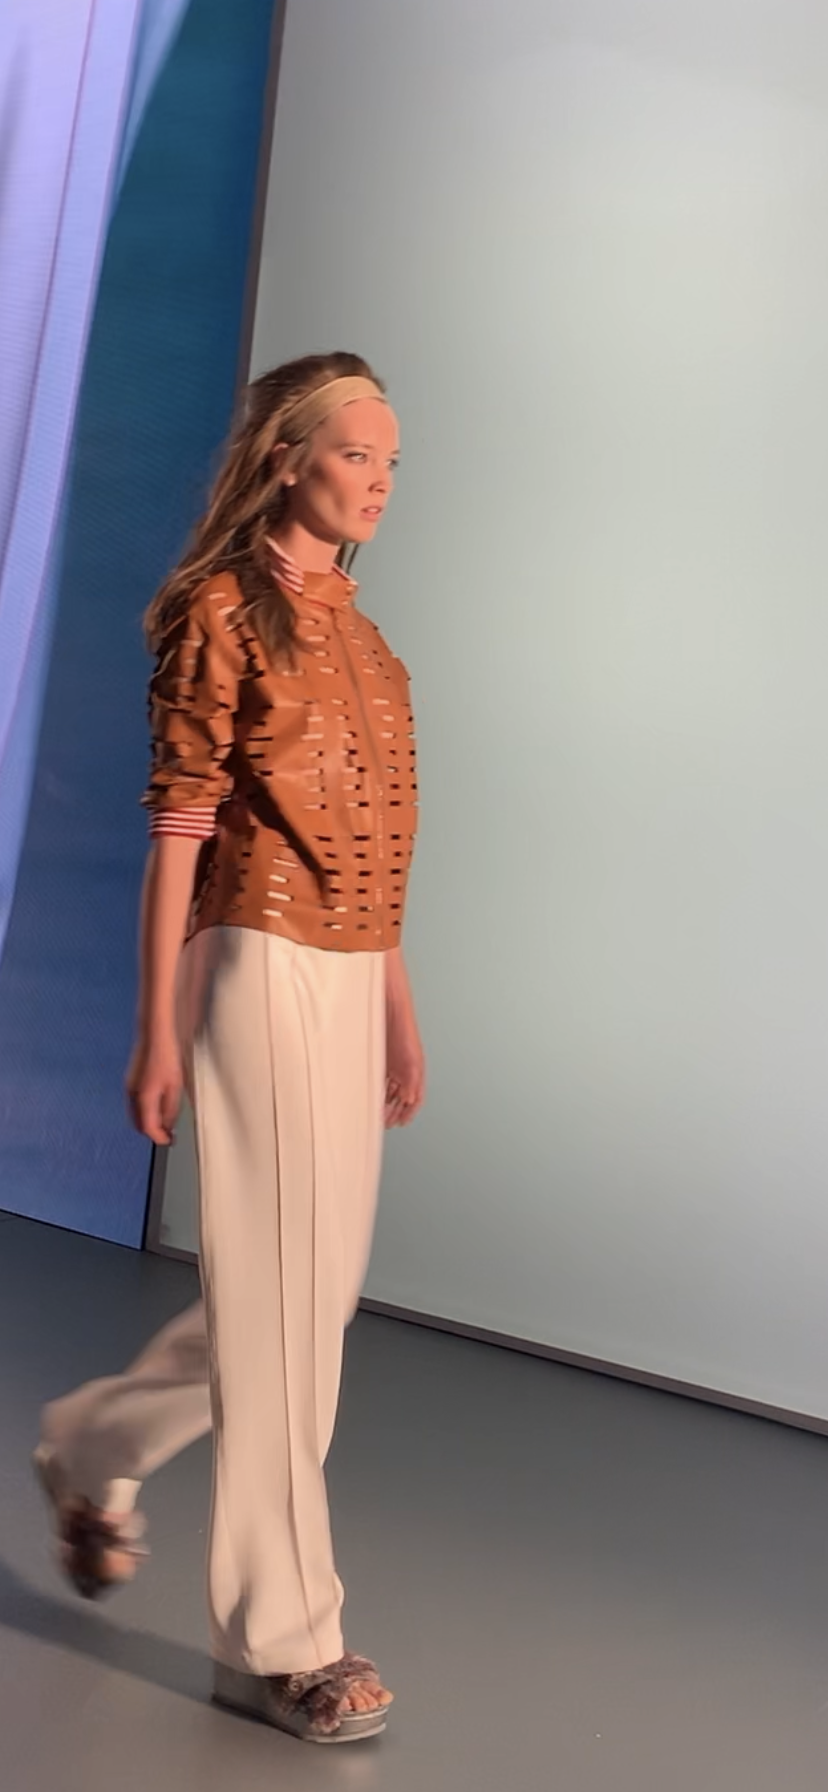 Whynot-shopper-080-bcn-fashion-tendencias-agnes-sunyer-2020